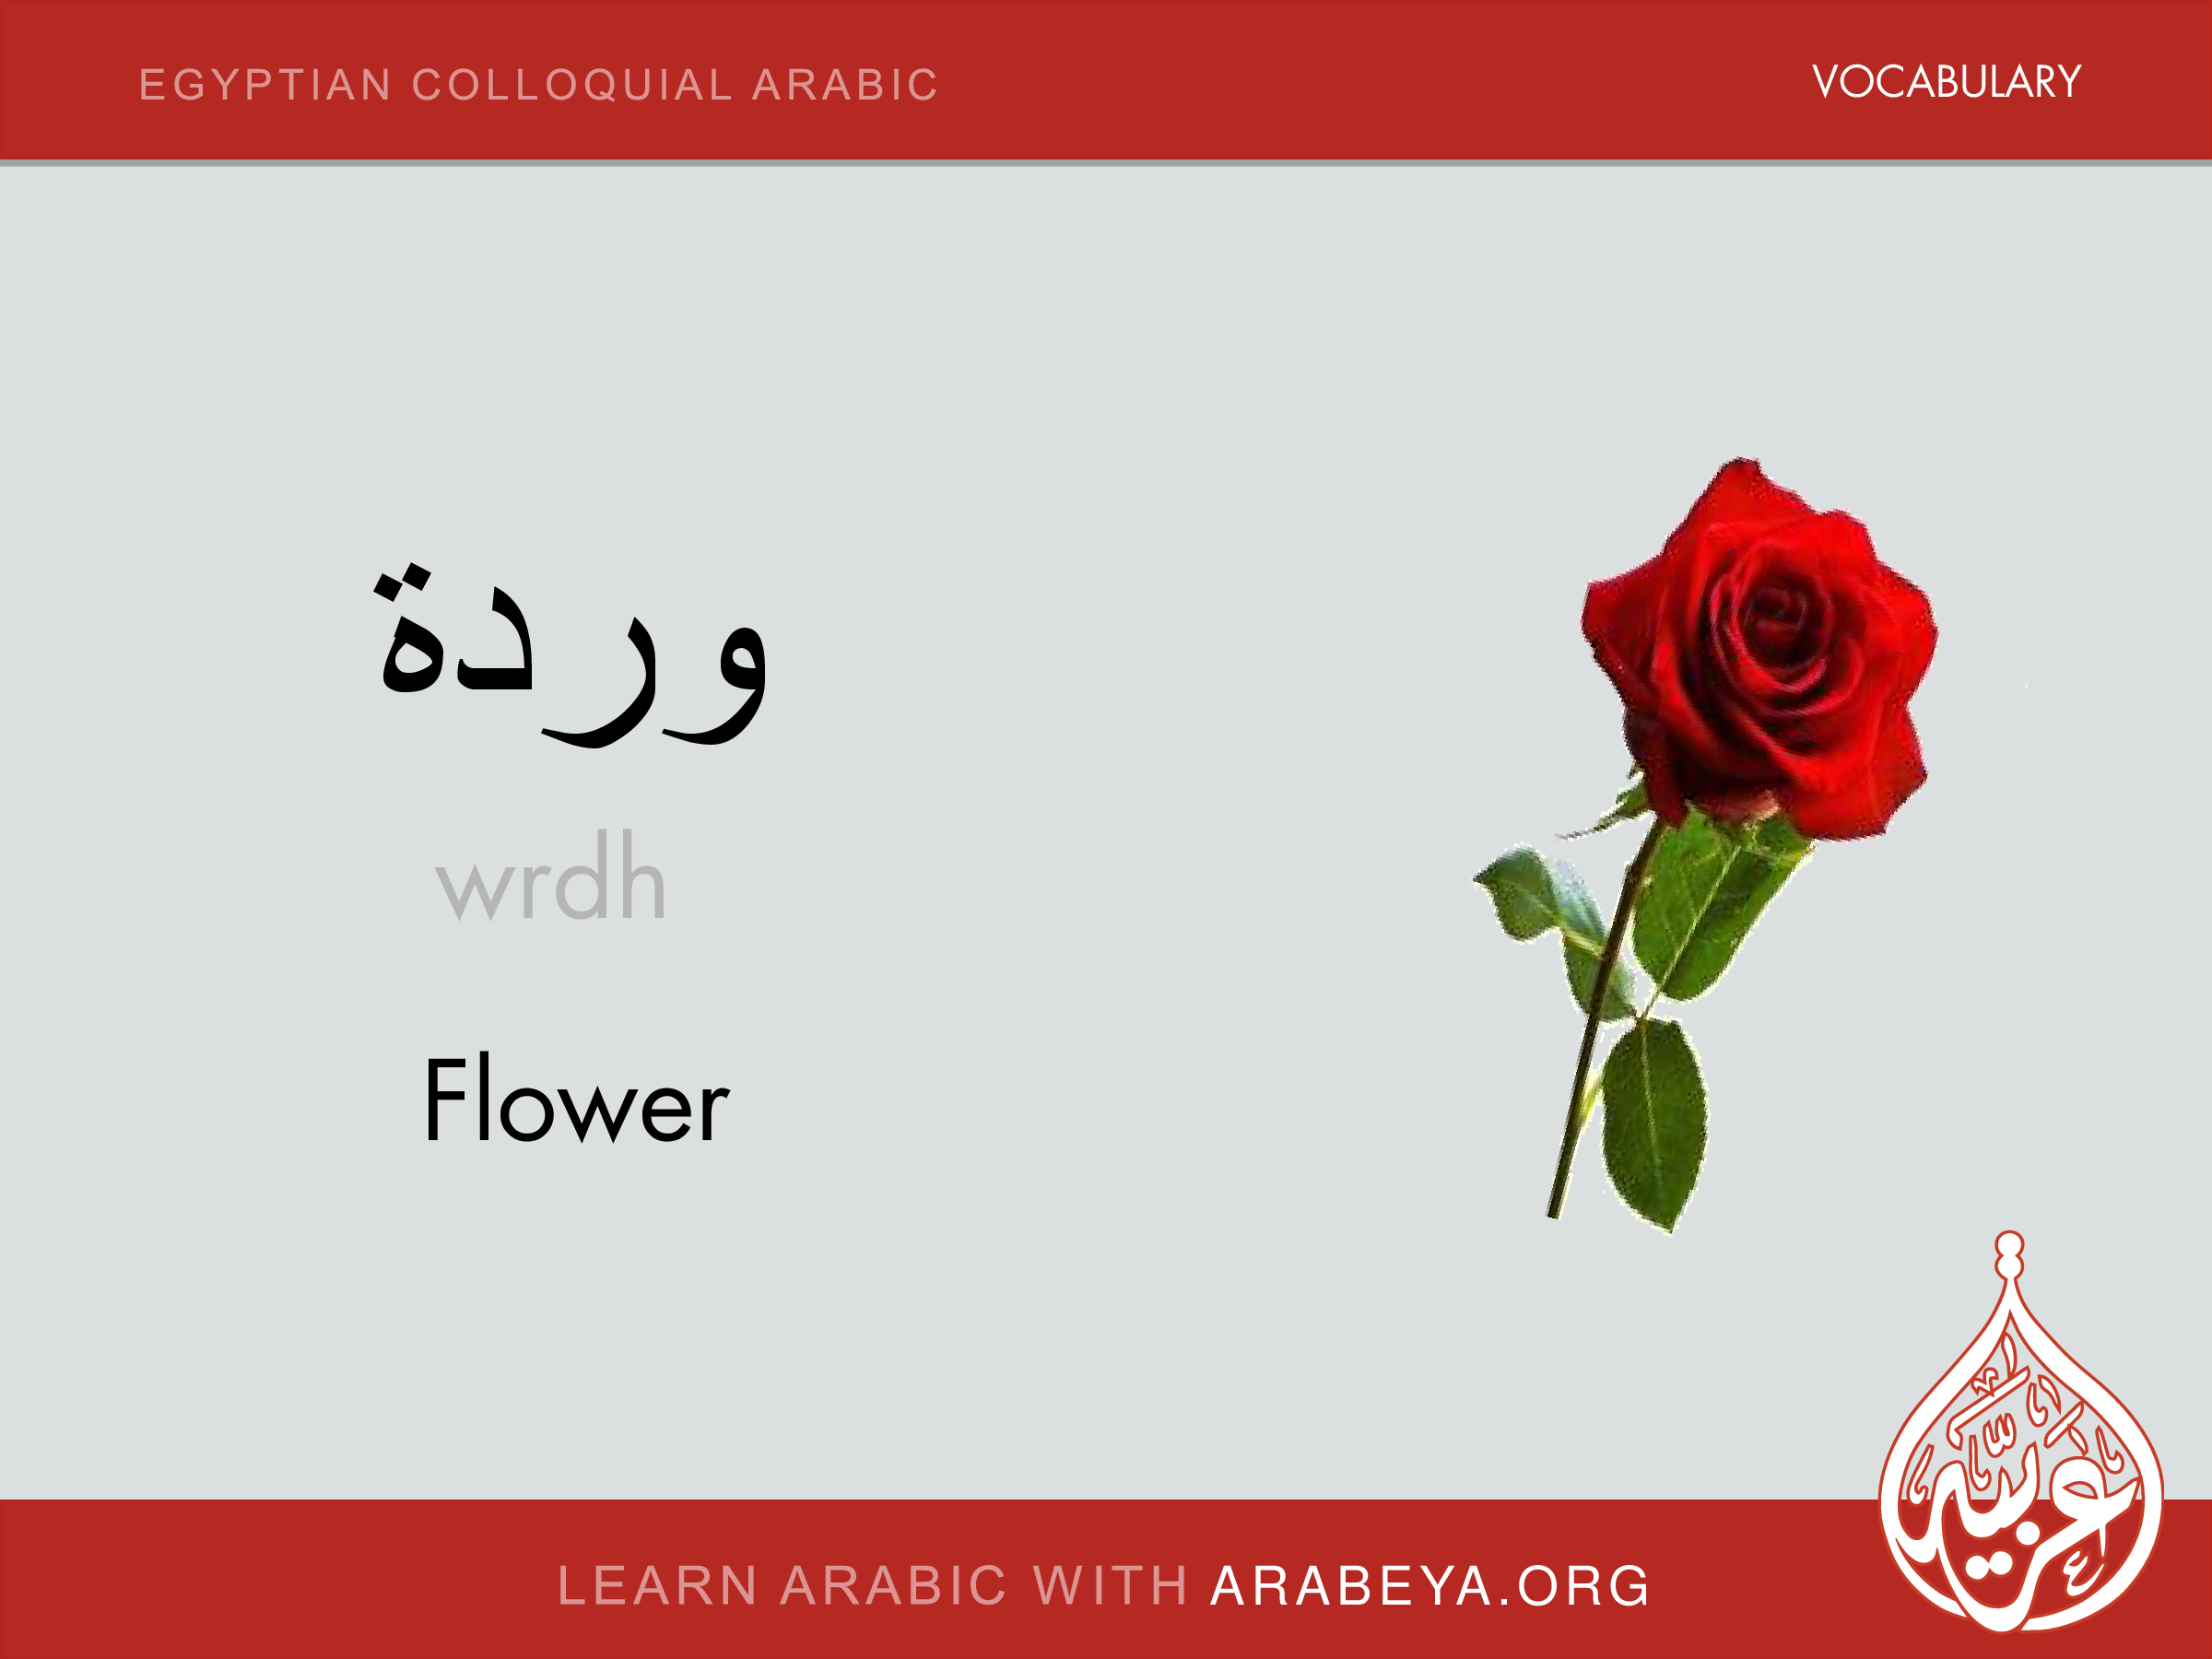 Flower | Egyptian Colloquial Arabic Vocabulary | Spoken